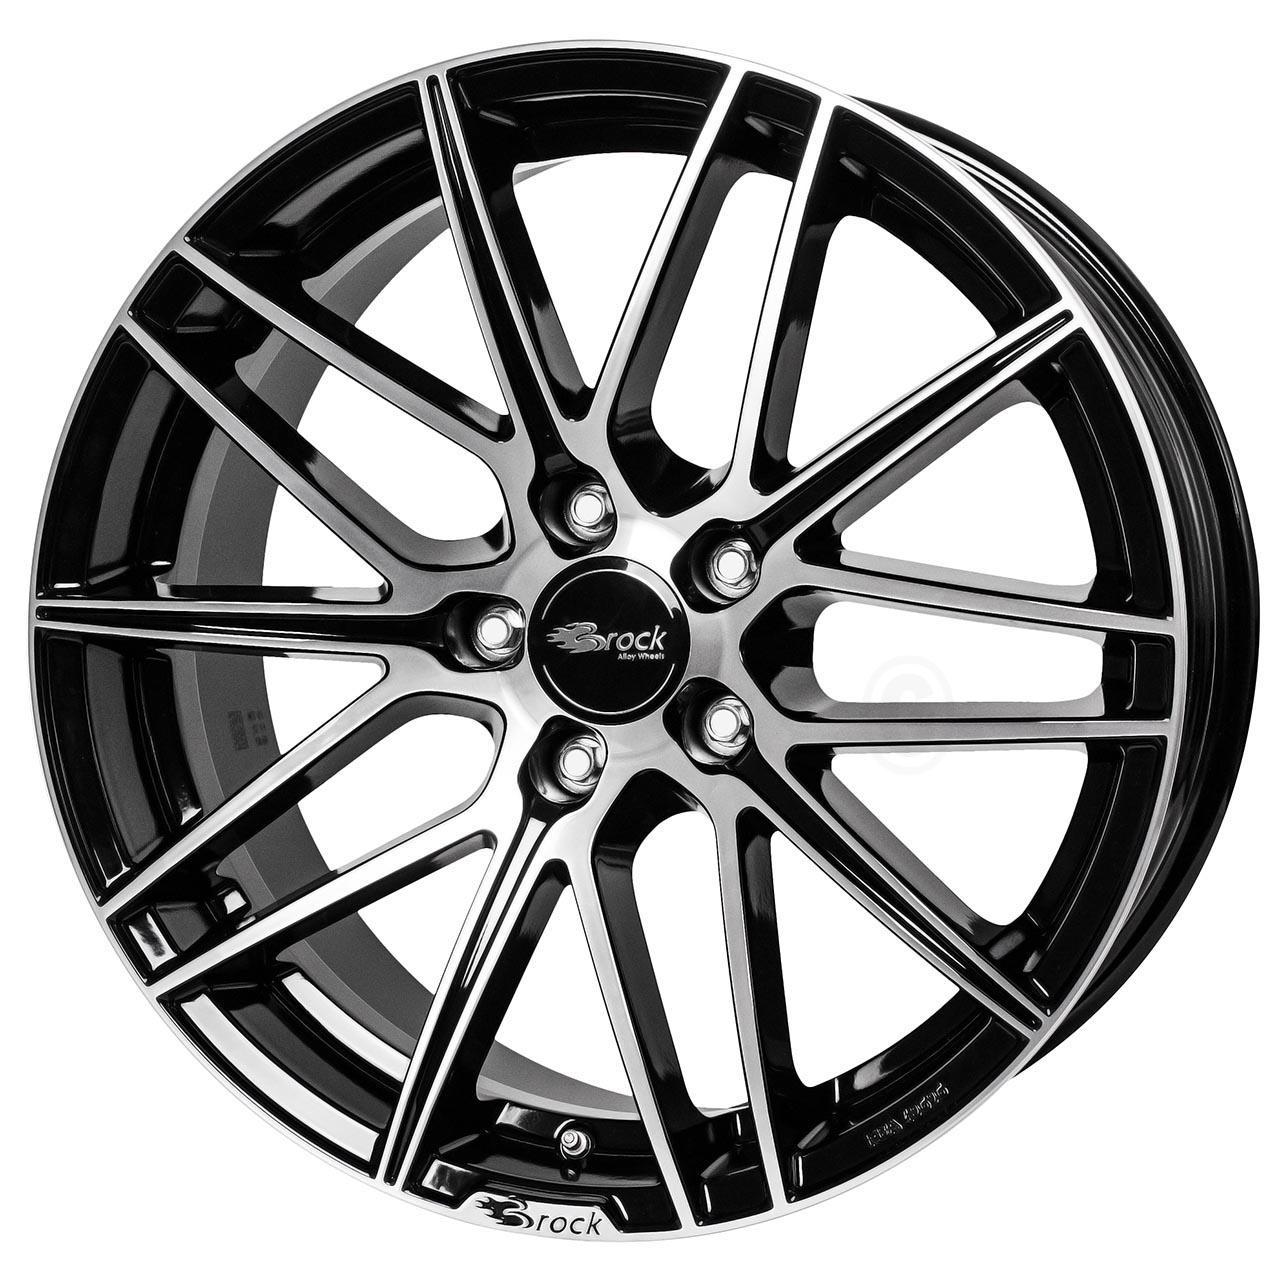 Brock B34 Black glossy full polished 8x18 5x112 ET35